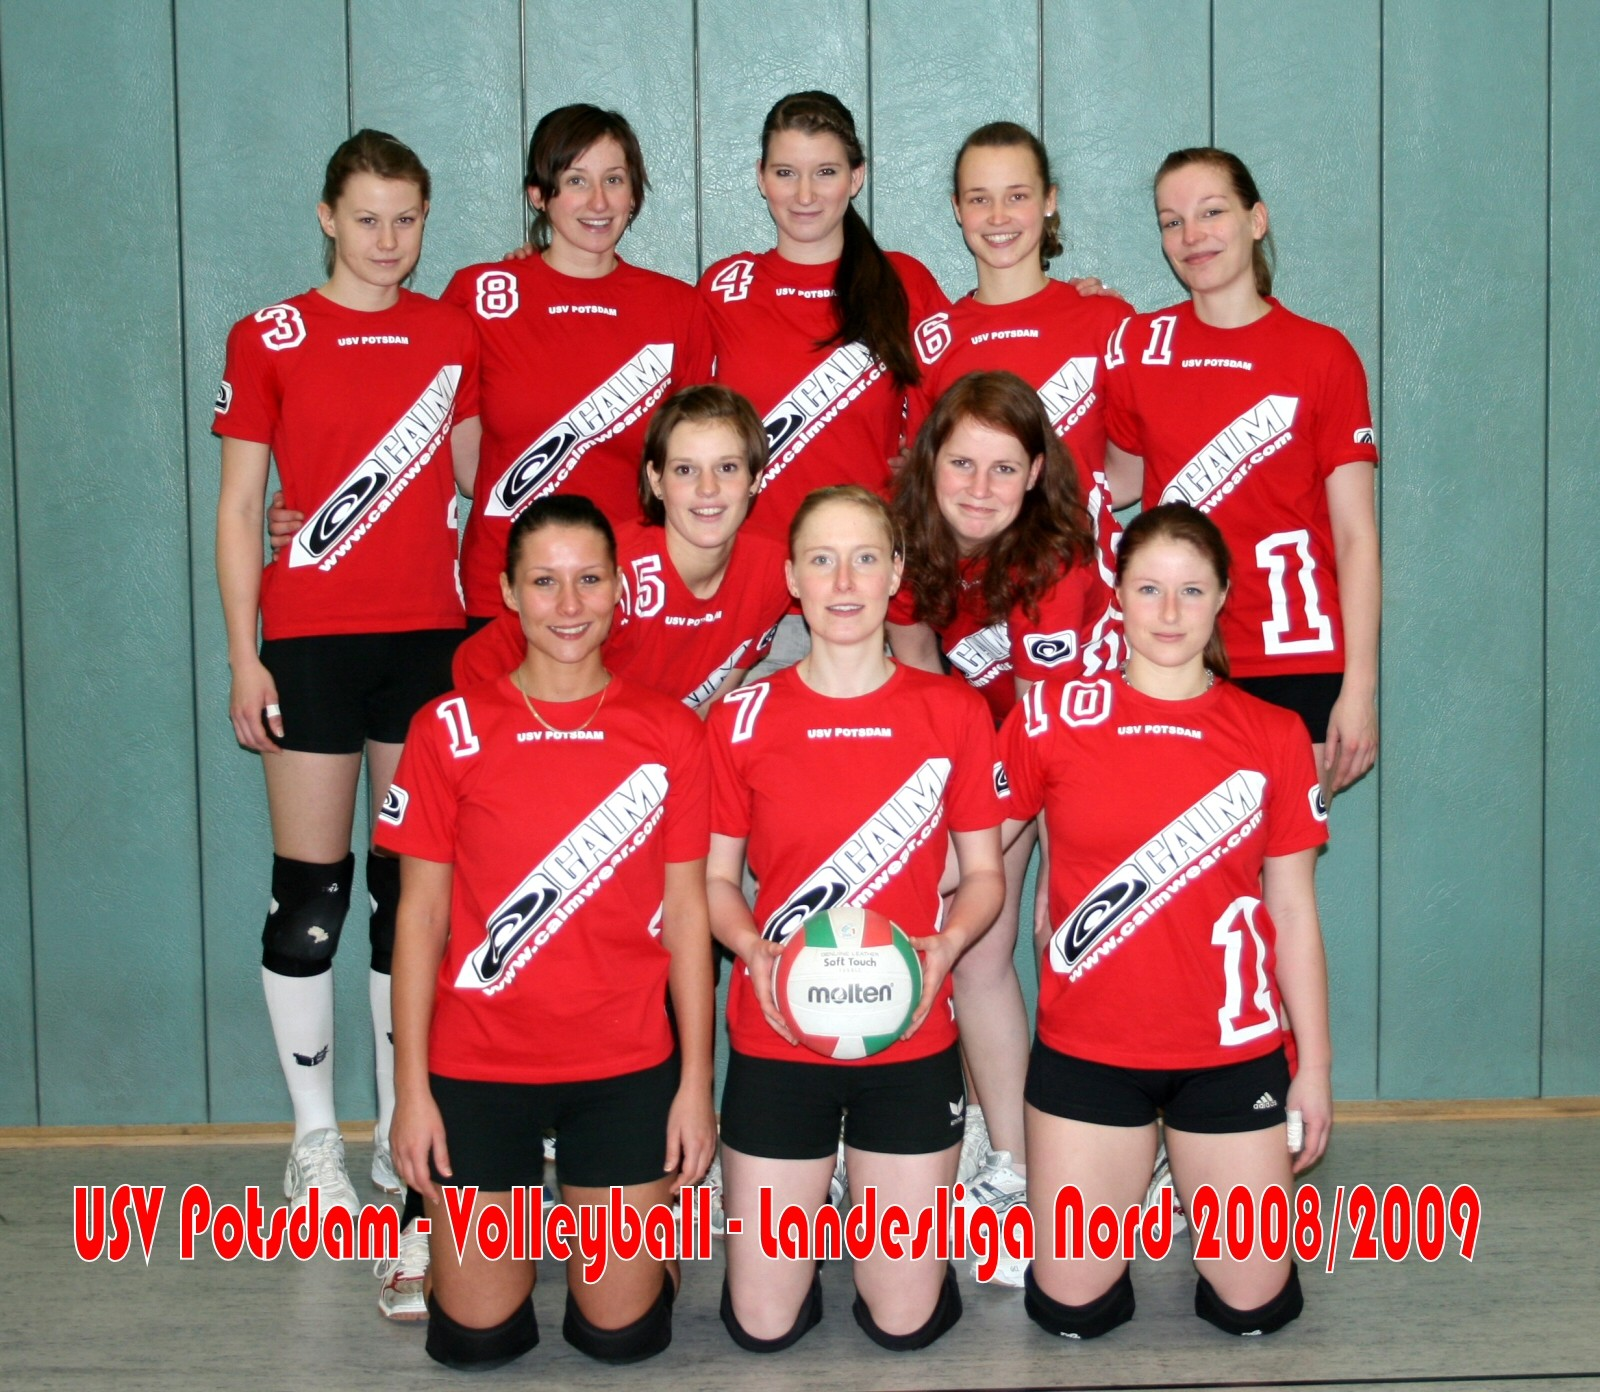 Landesliga Nord 2008/2009